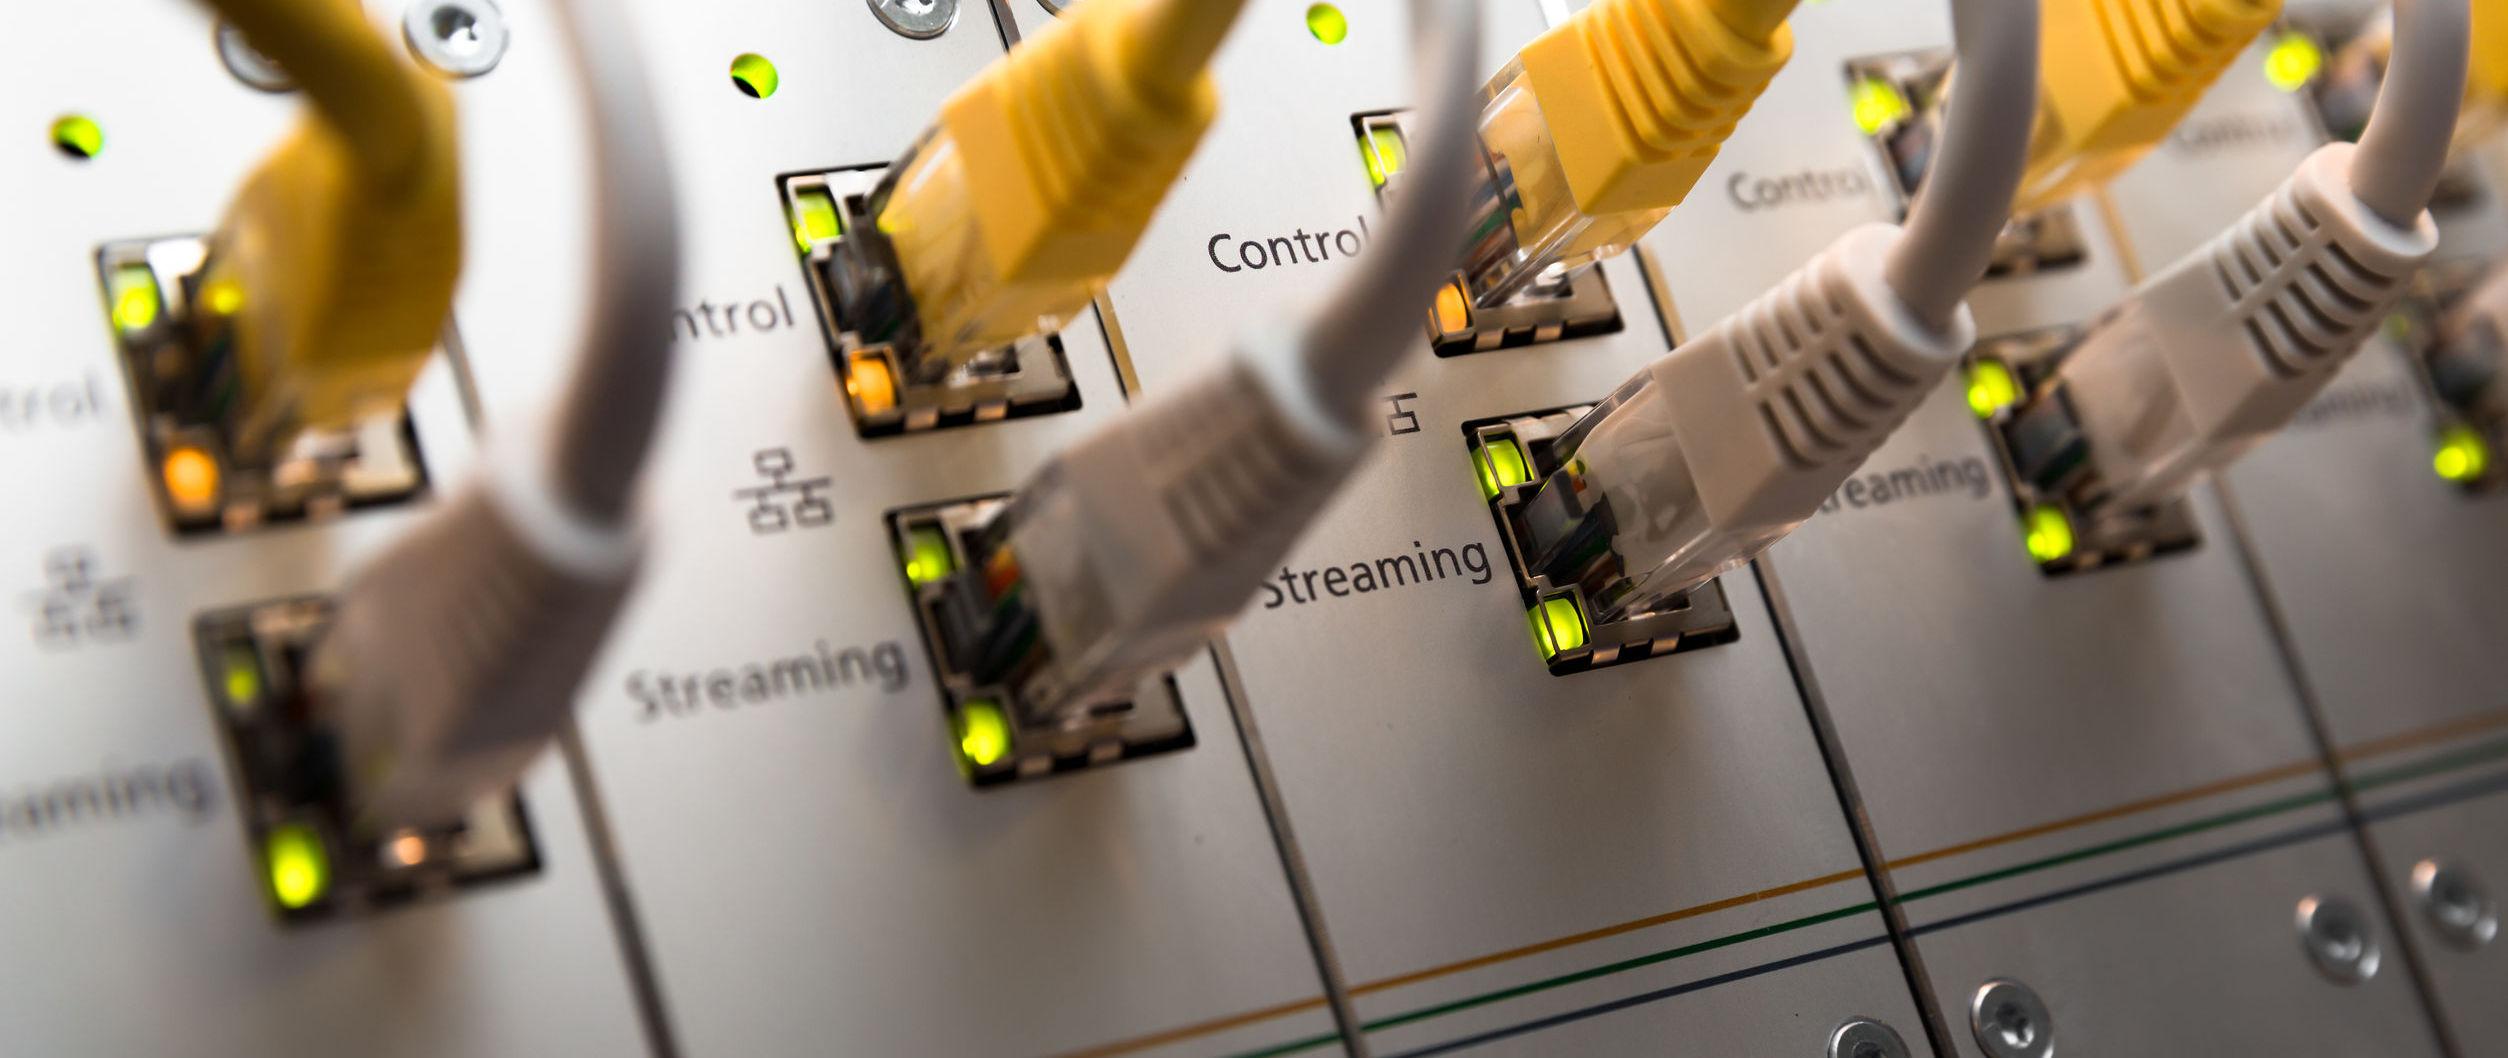 NDSL internet